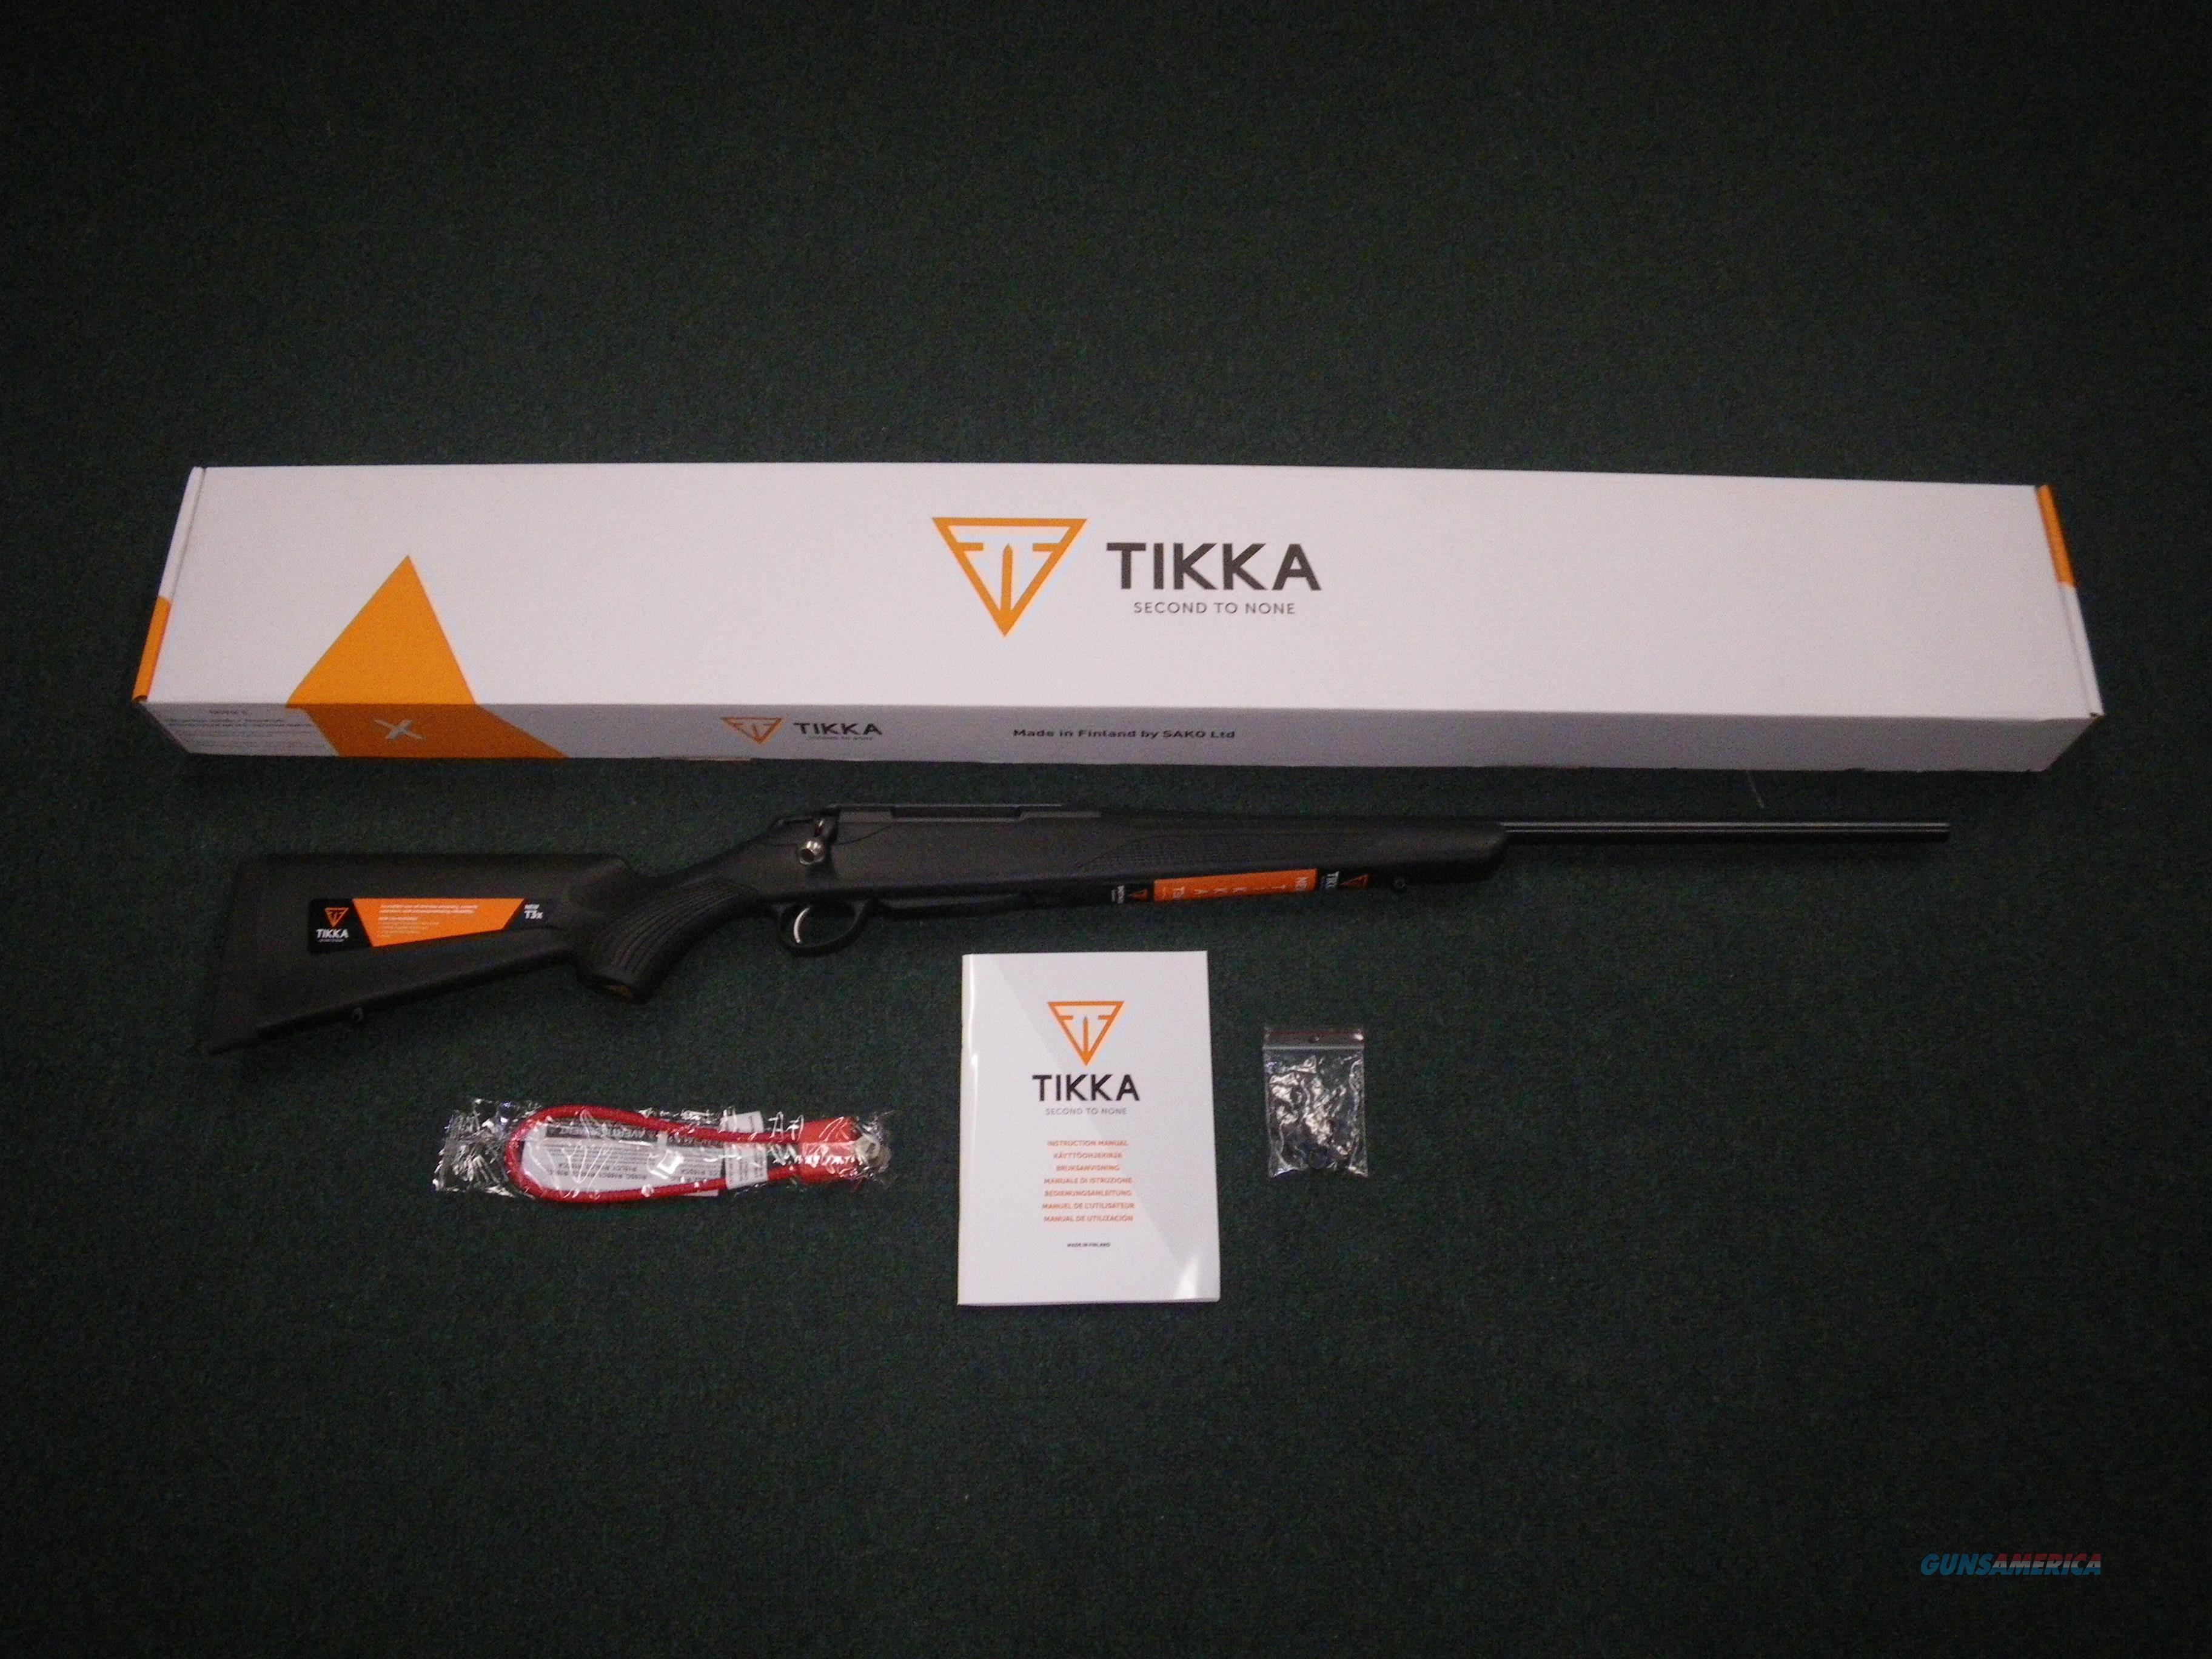 "Tikka T3x Lite Synthetic Blued 6.5 Creed 24.4"" NEW JRTXE382  Guns > Rifles > Tikka Rifles > T3"